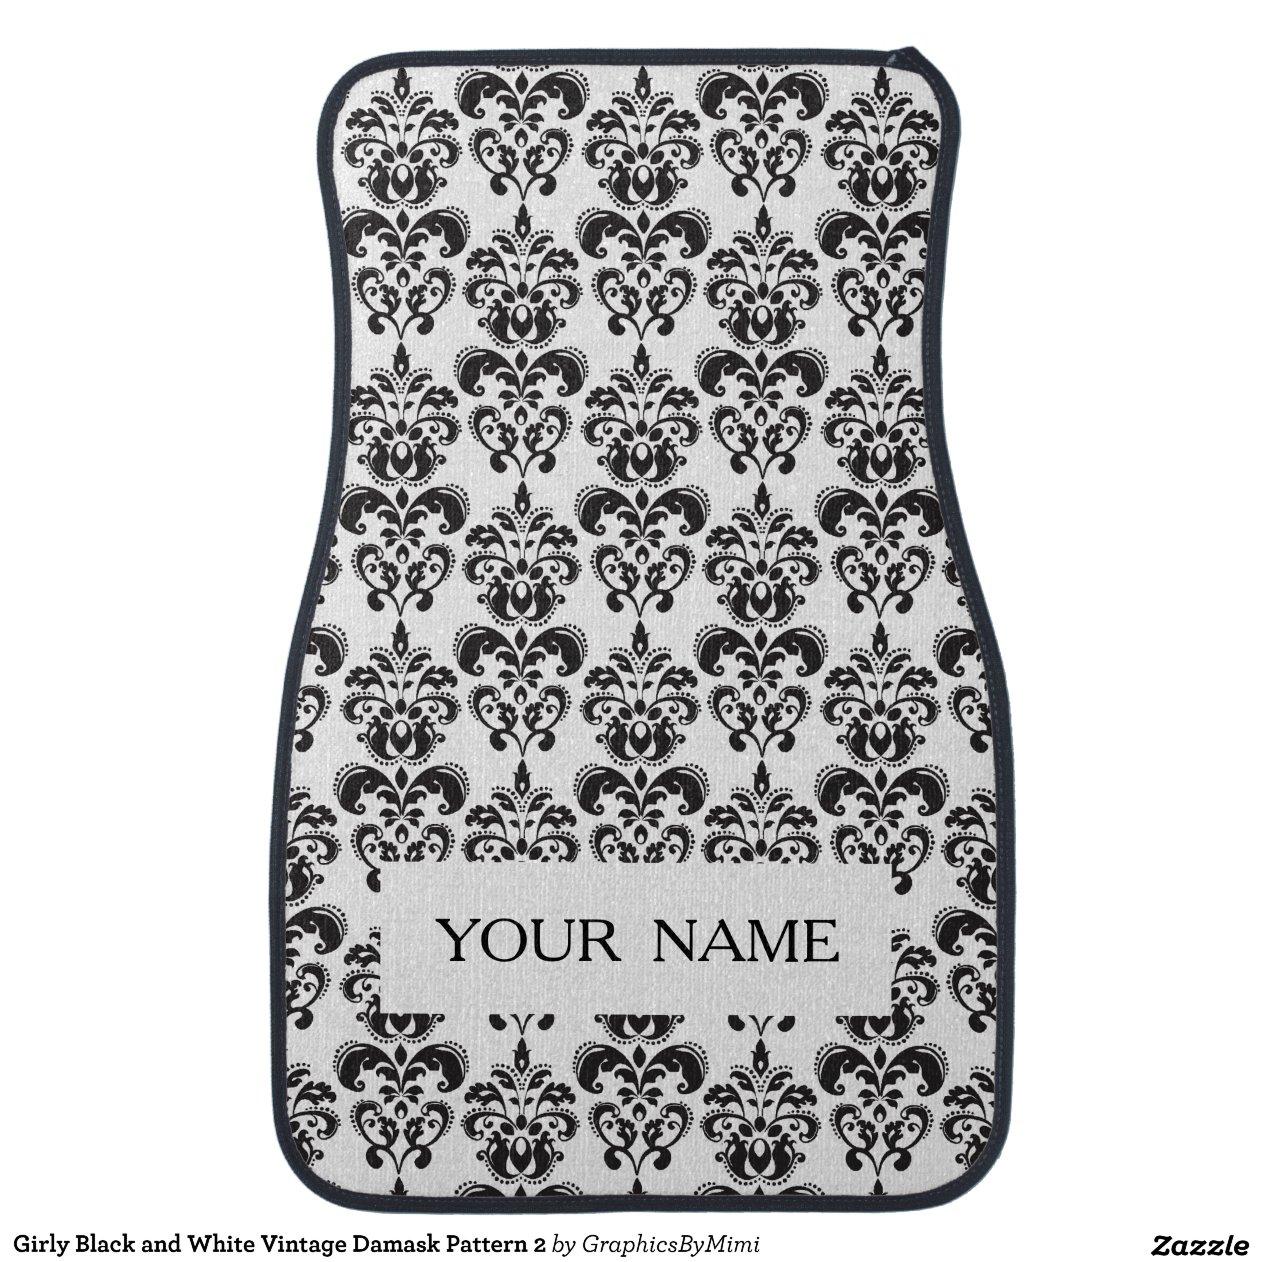 Girly Black And White Vintage Damask Pattern 2 Zazzle